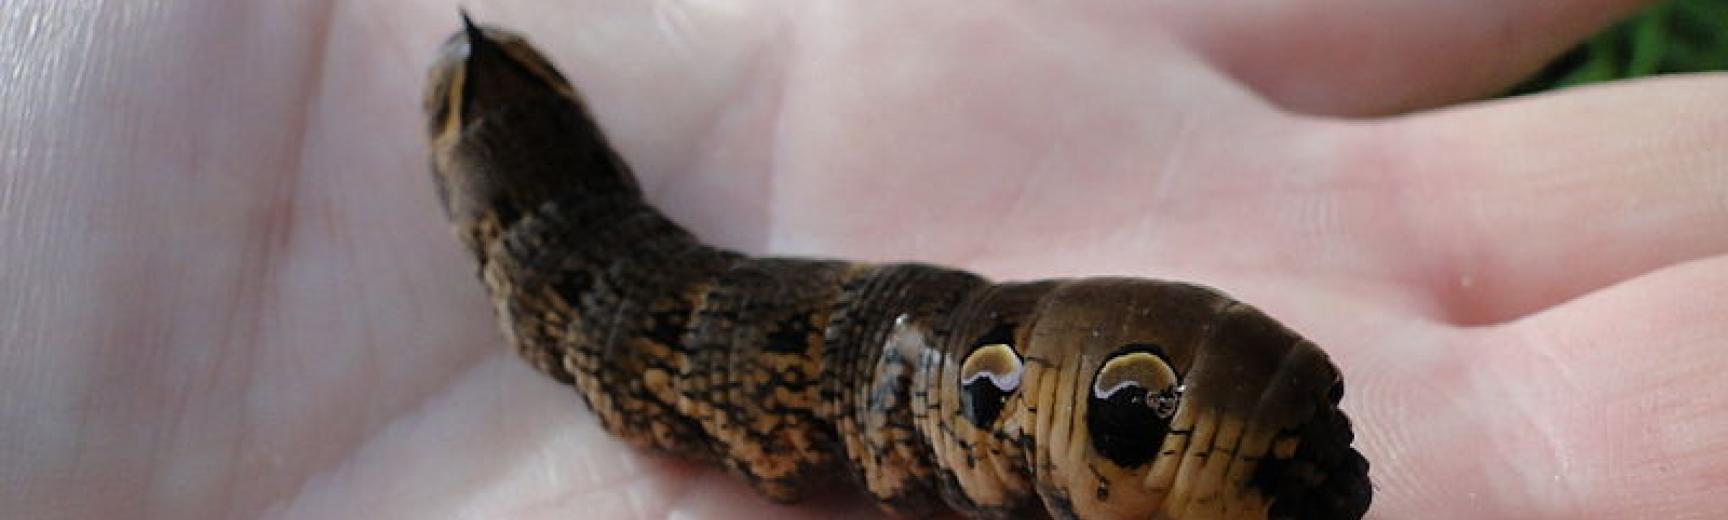 Deilephila elpenor with head retracted